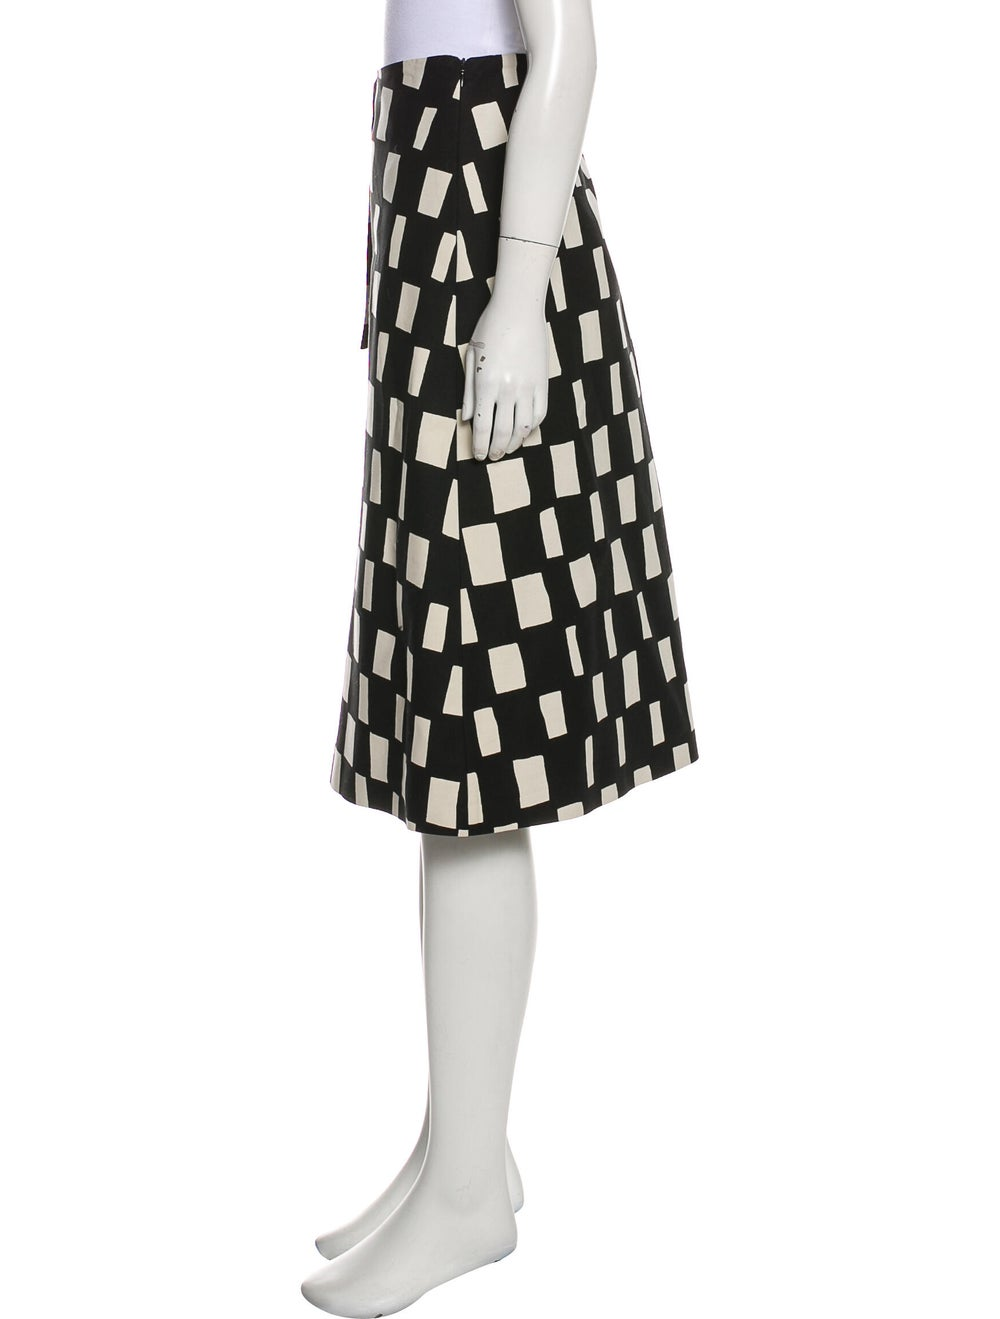 Marimekko Patterned Knee-Length Skirt Black - image 2